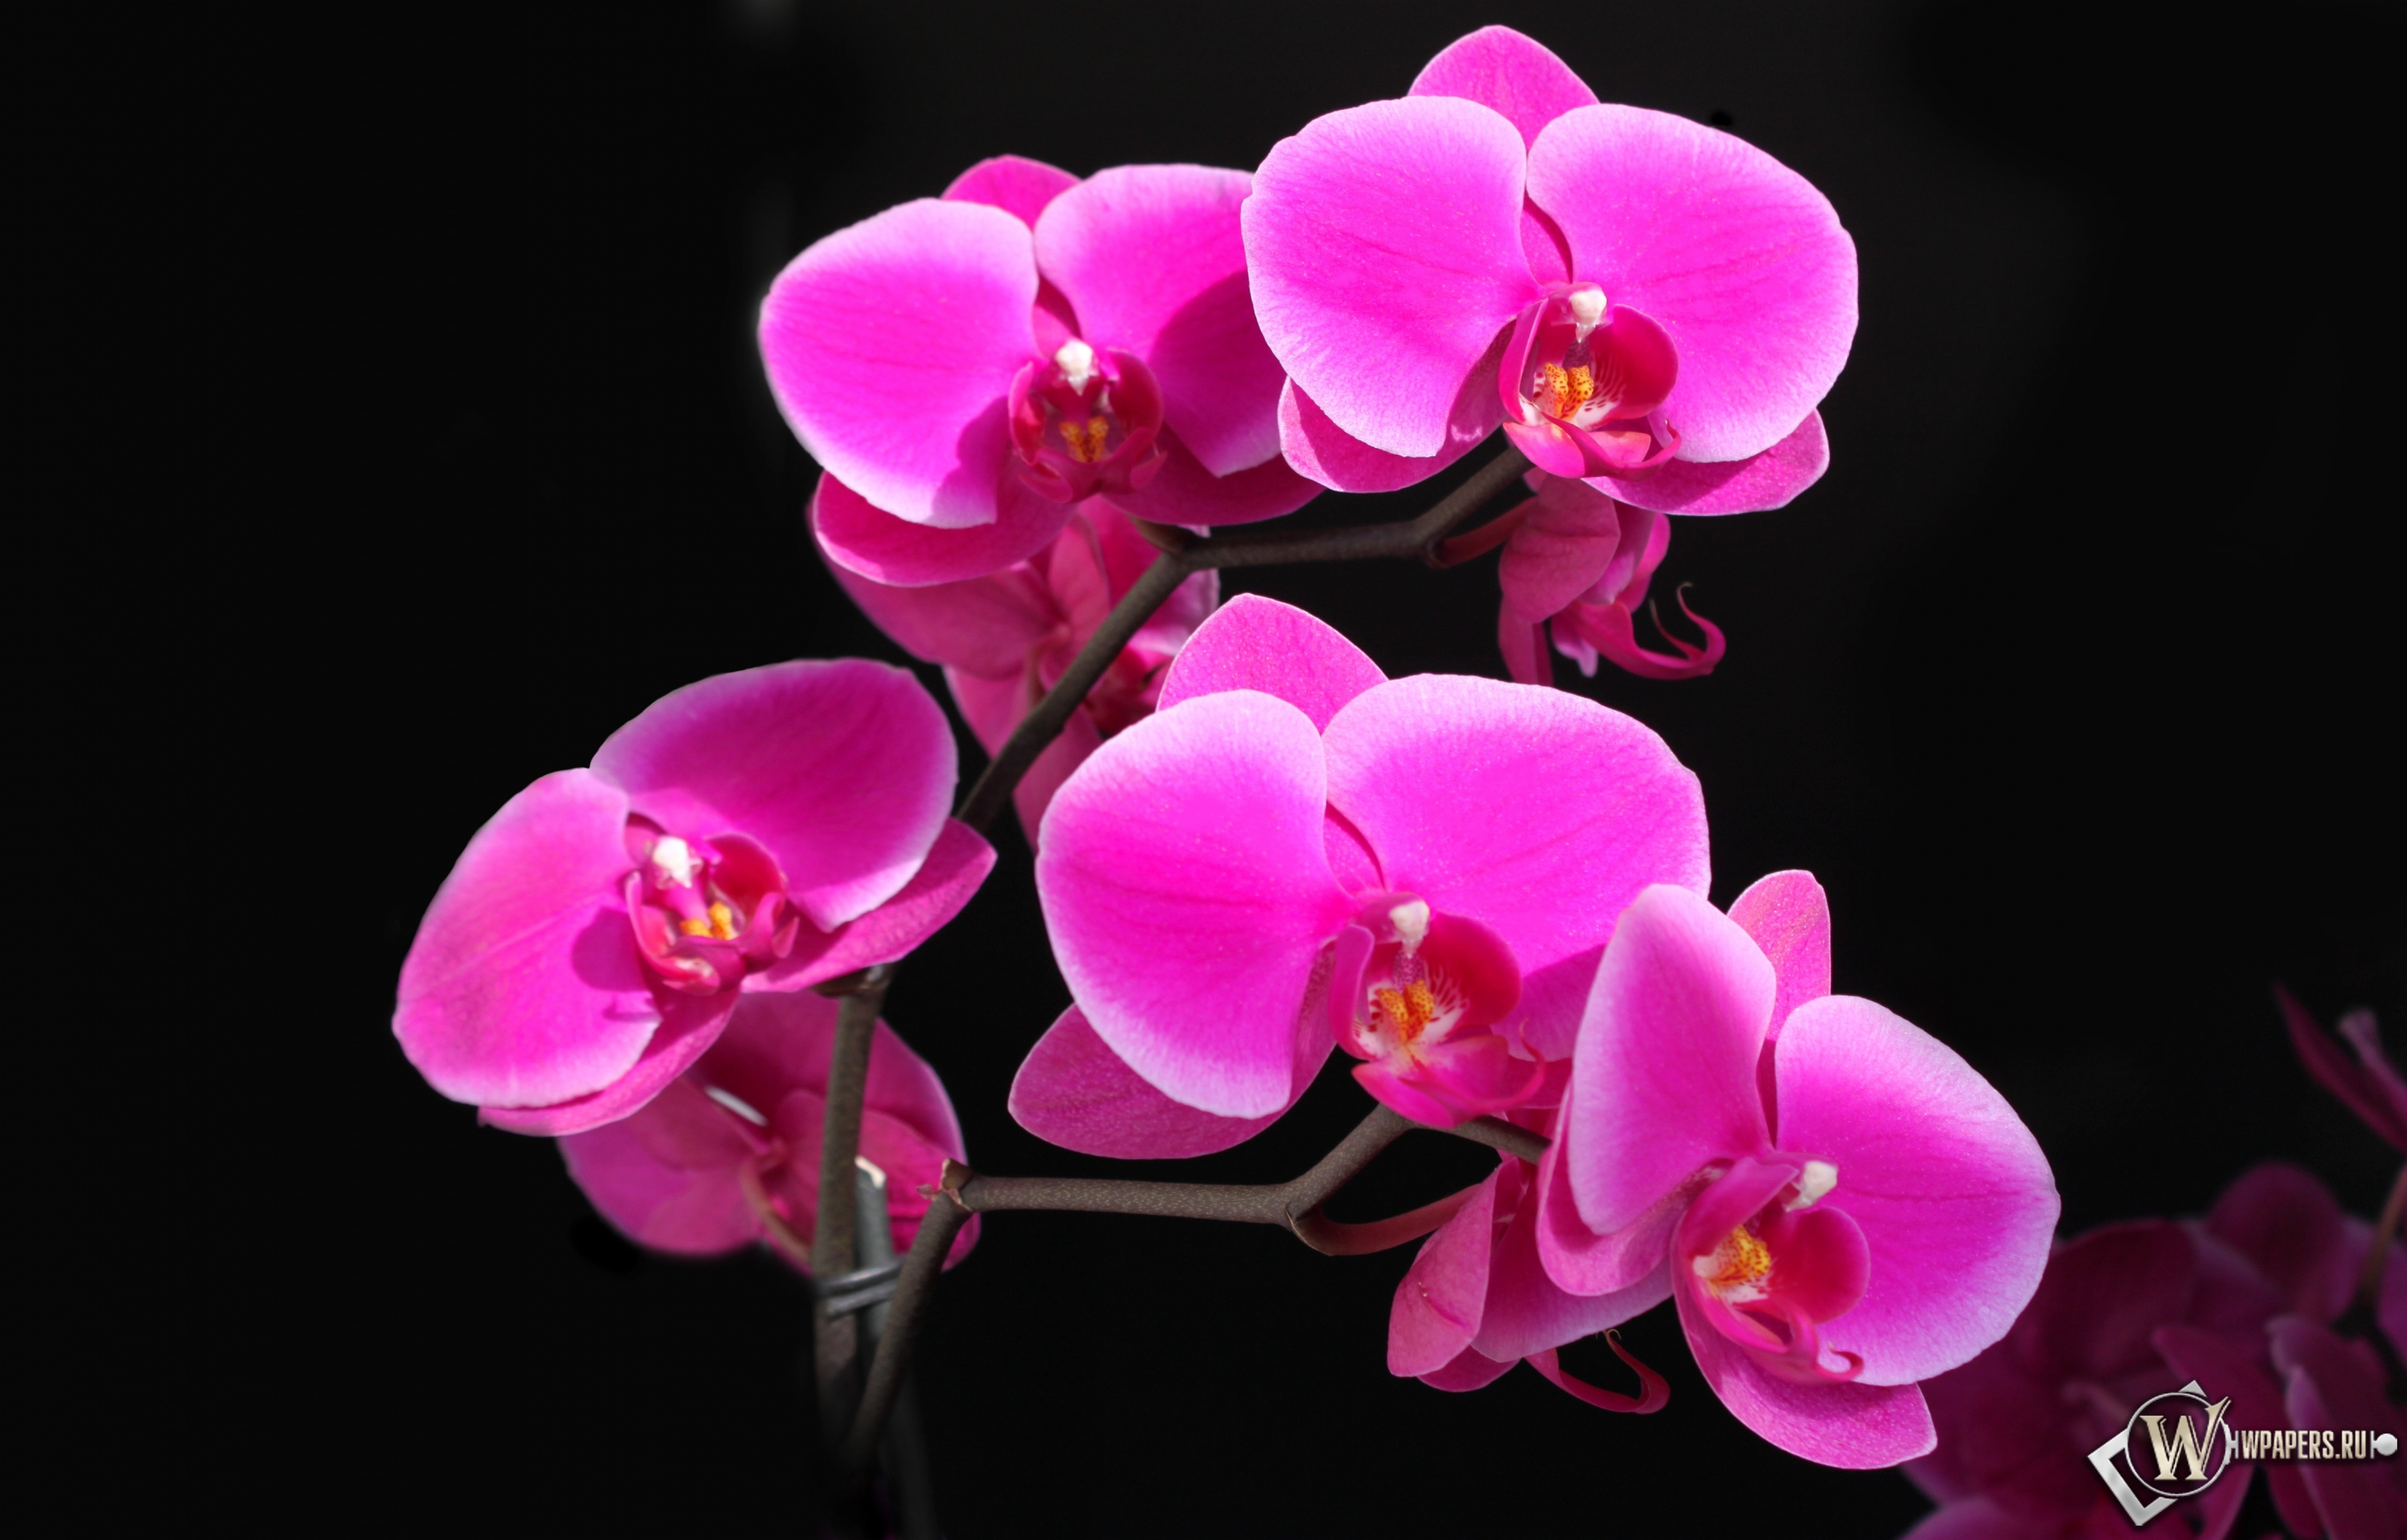 Розовый фаленопсис 3200x2048